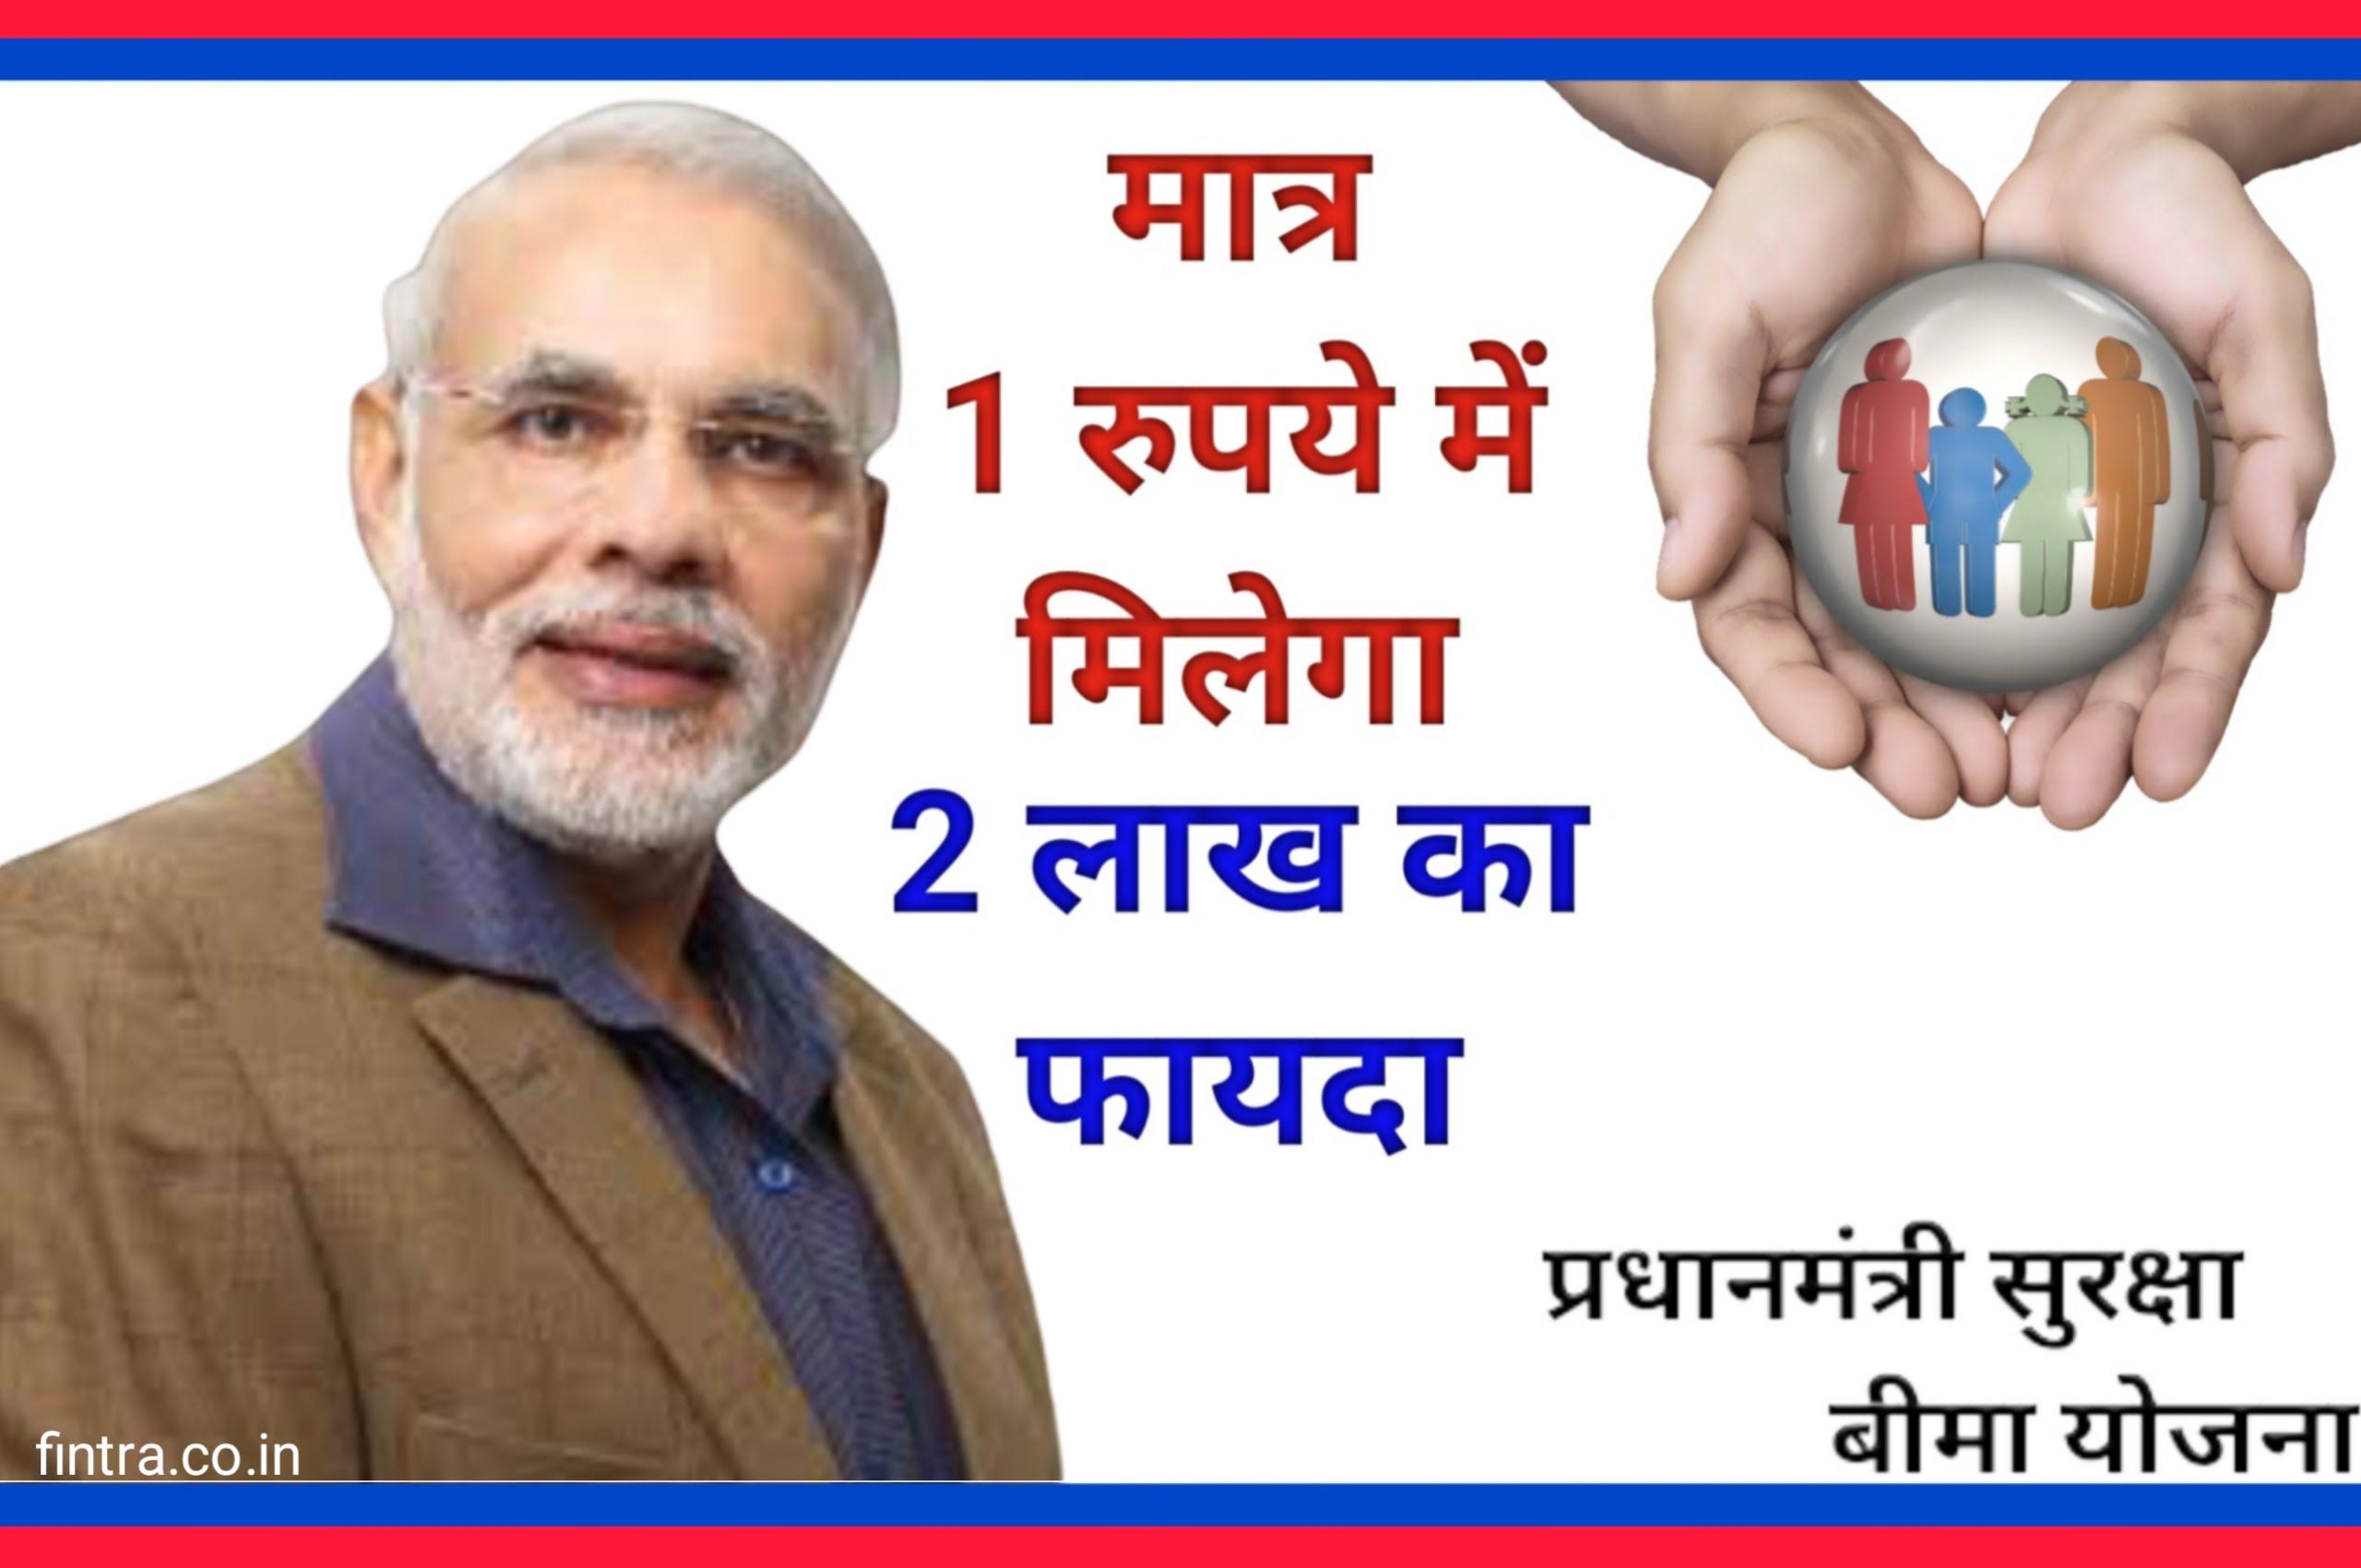 प्रधानमंत्री सुरक्षा बीमा योजना (पीएमएसबीवाई)